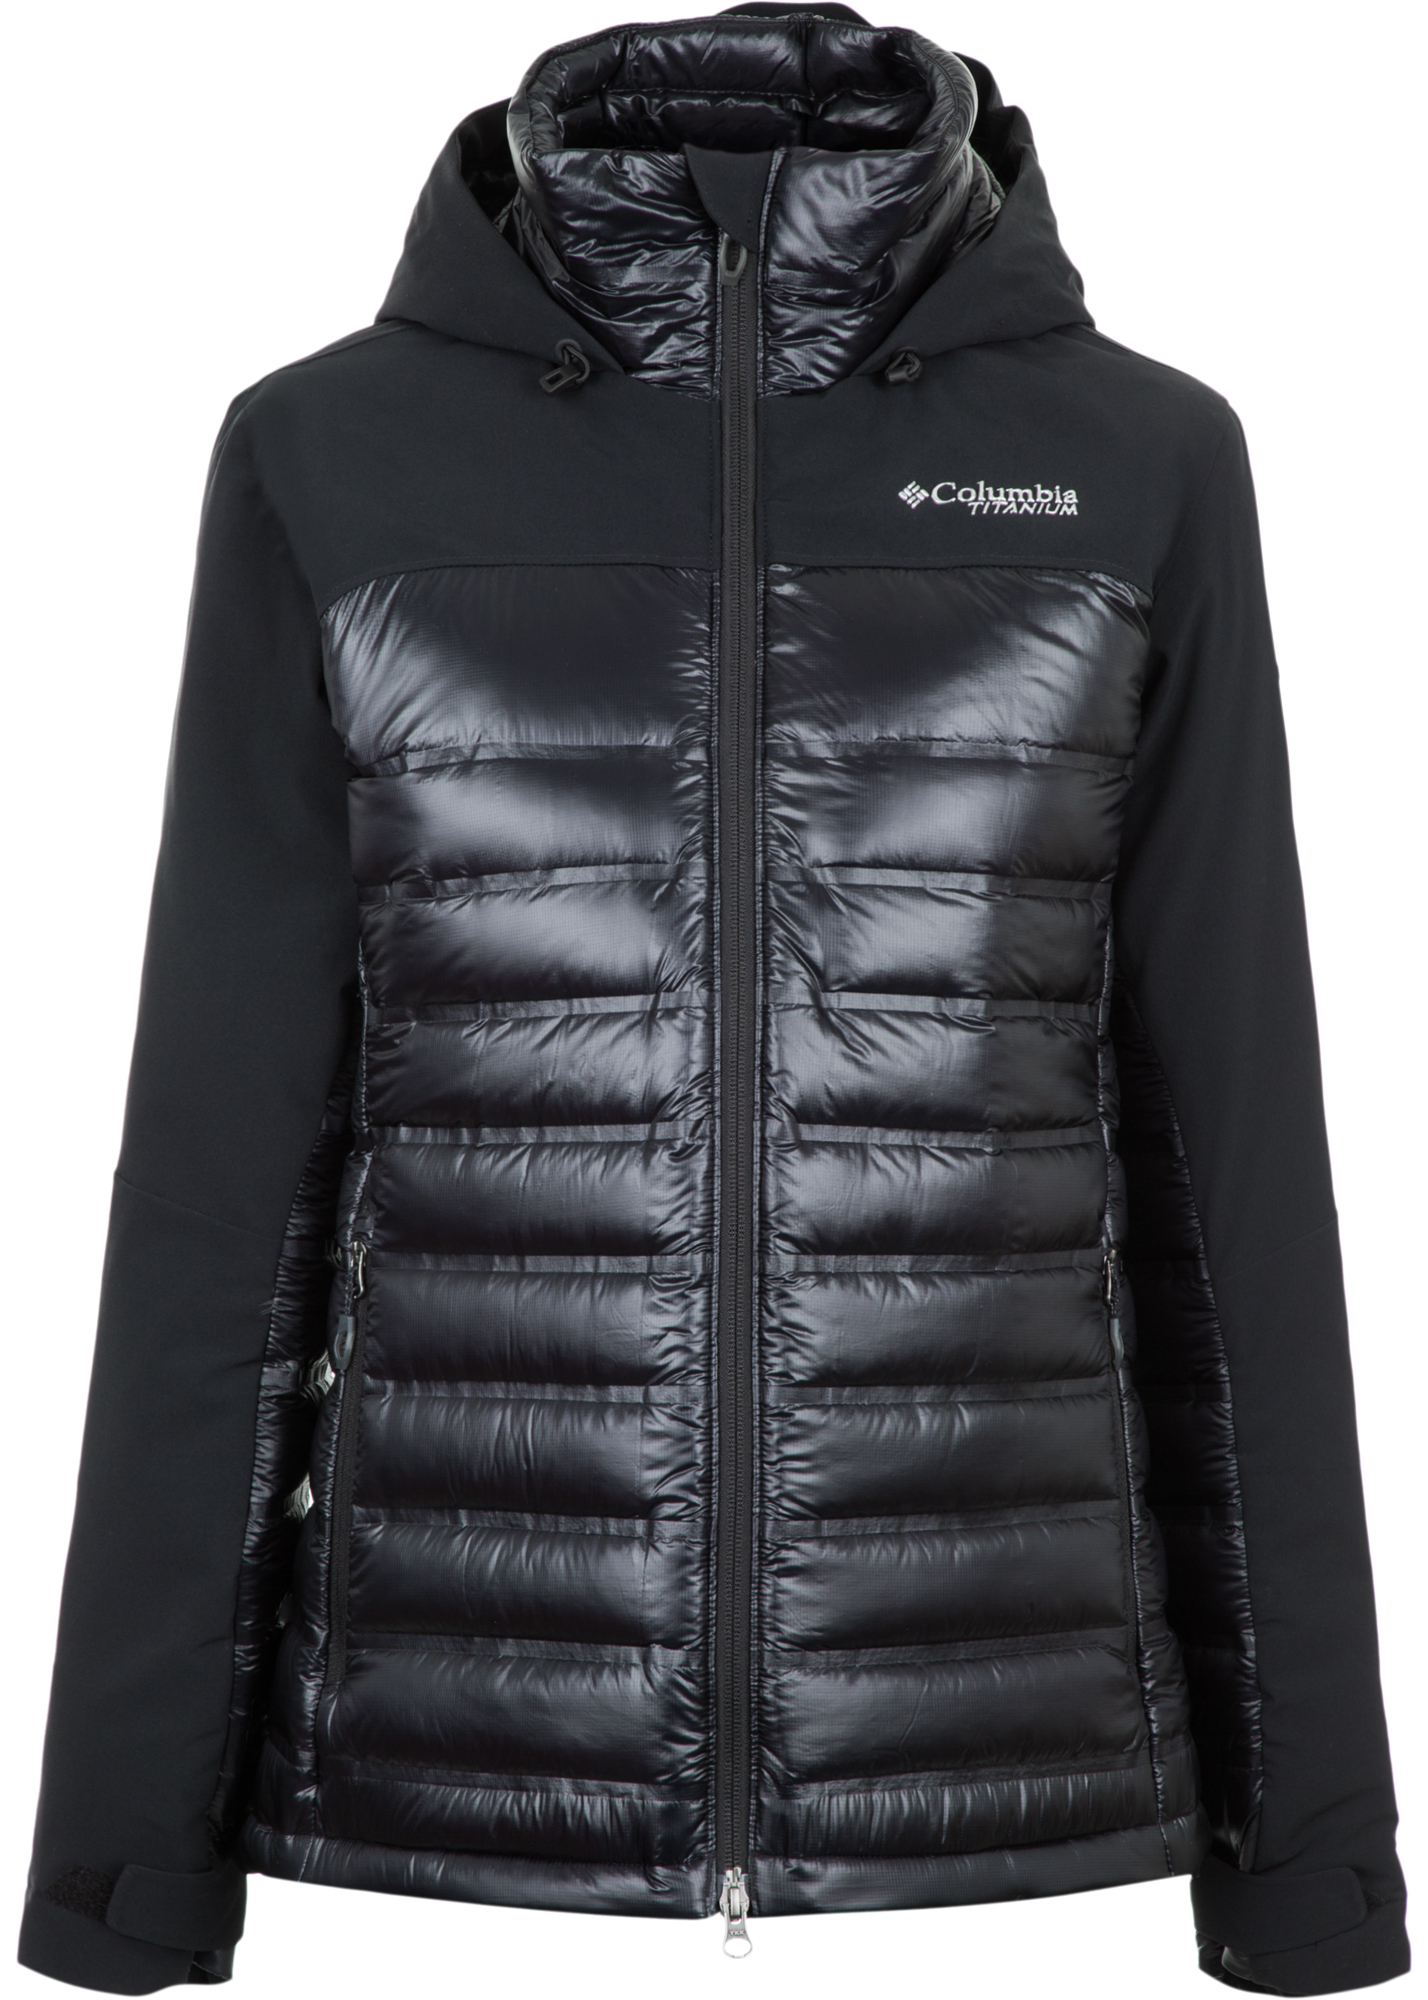 Columbia Куртка пуховая женская Columbia Heatzone 1000 TurboDown II, размер 50 pajar куртка пуховая женская cougar xl jet black